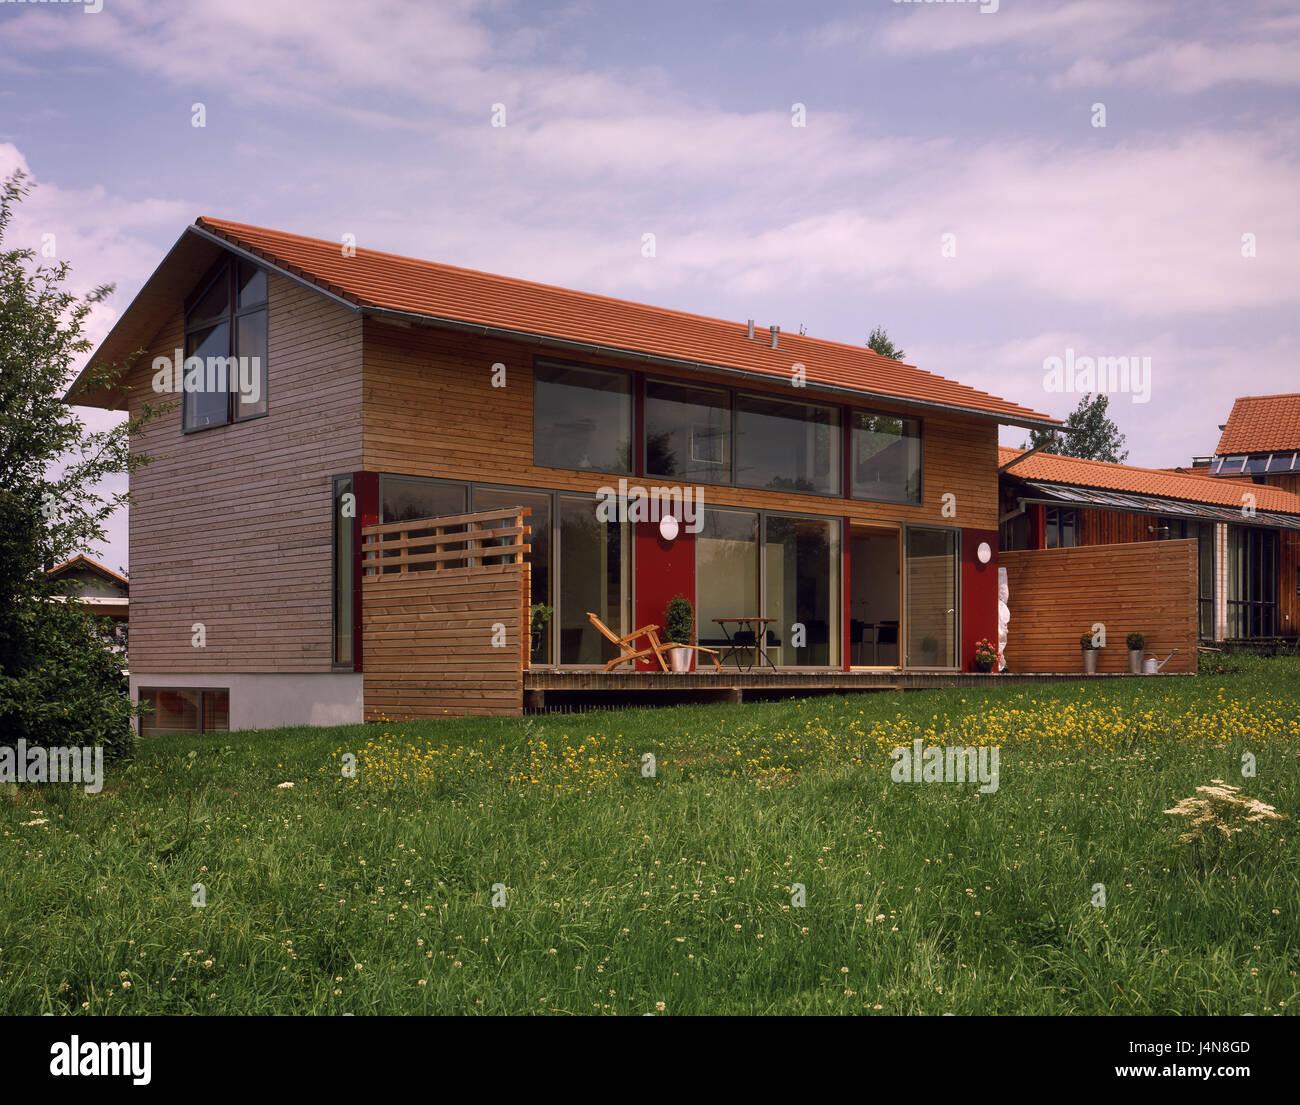 Garten immobilien - Gartengestaltung doppelhaushalfte bilder ...